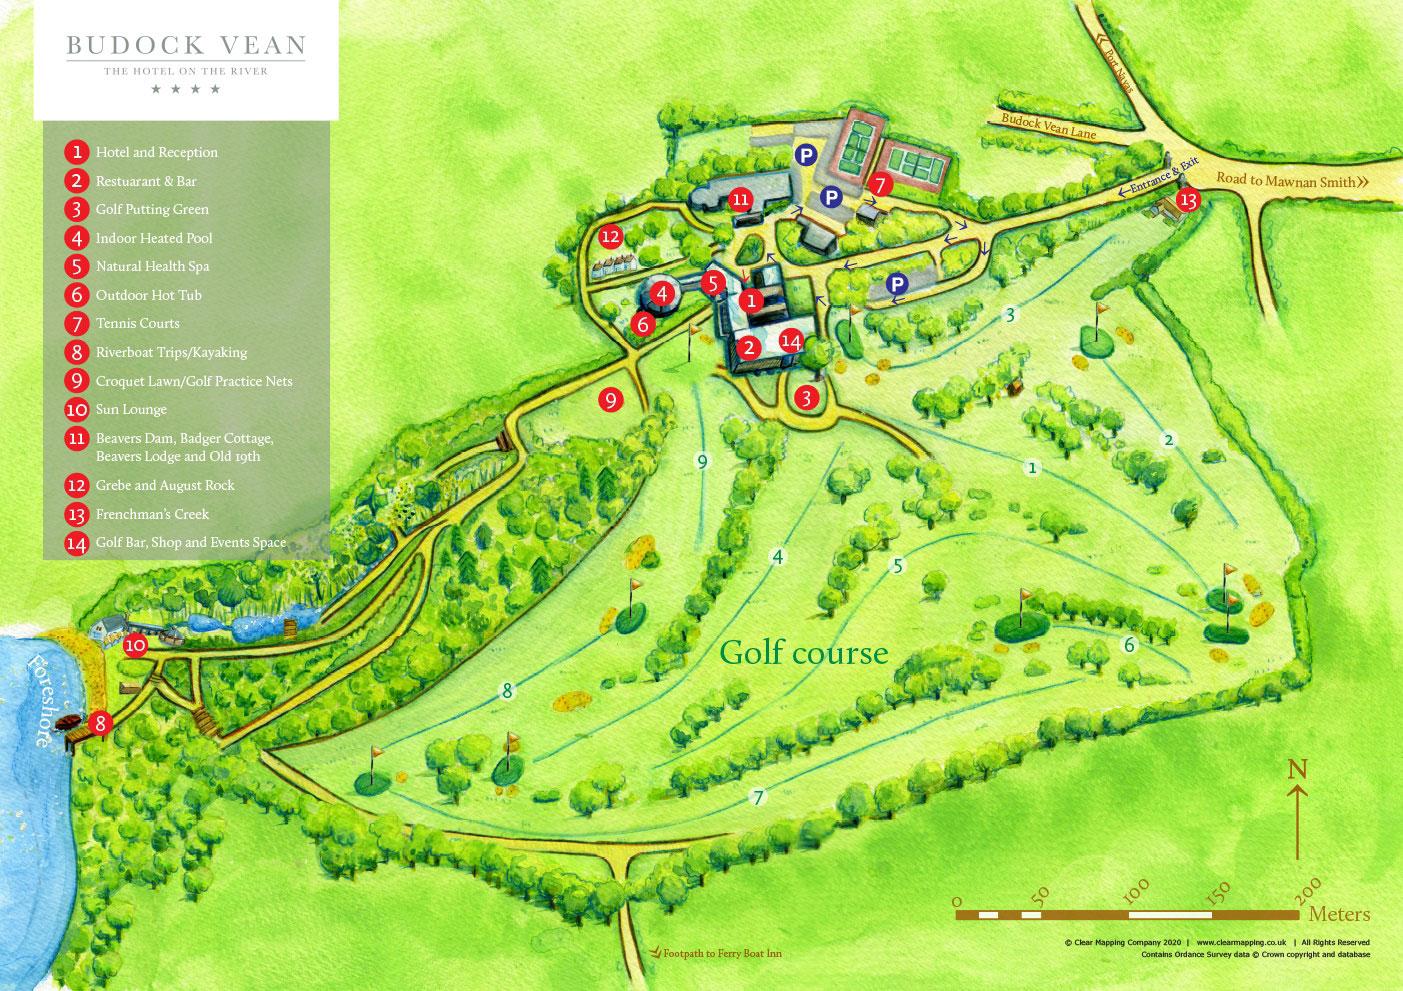 Budock Vean Hotel Corwnall | Estate Map